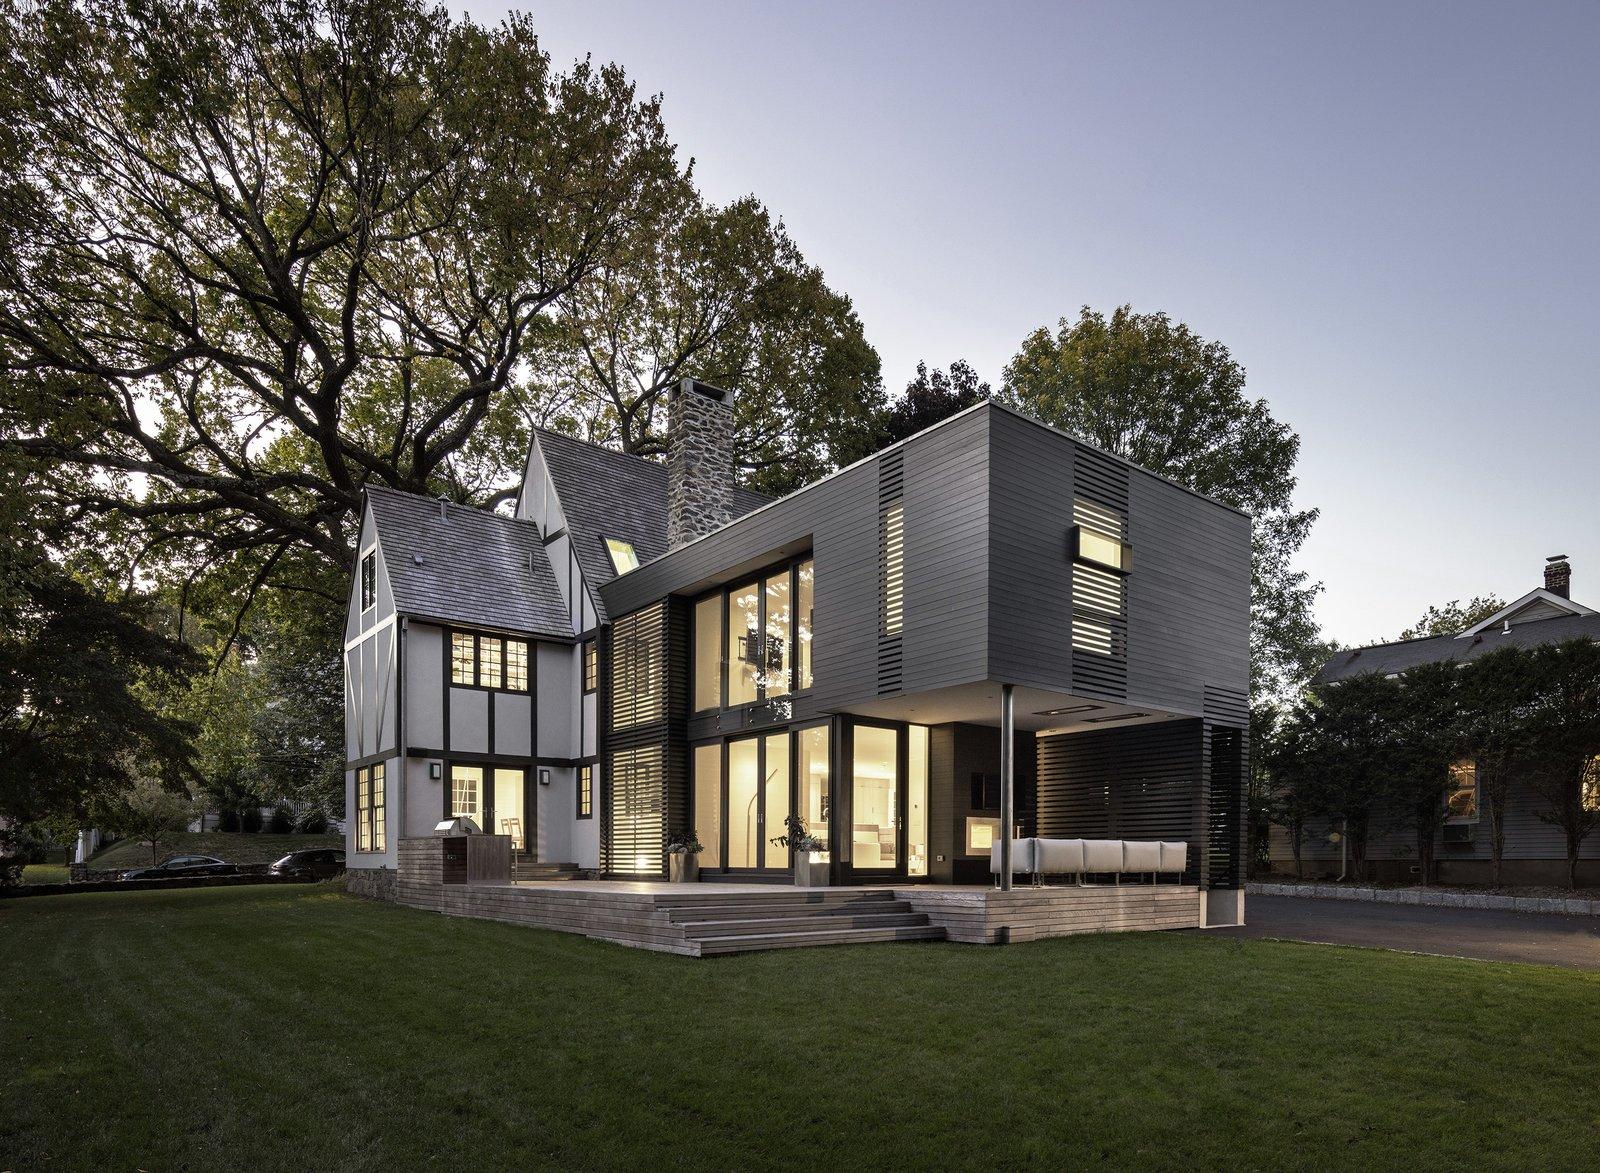 35hp by joeb moore partners dwell - Stonington residence by joeb moore partners ...